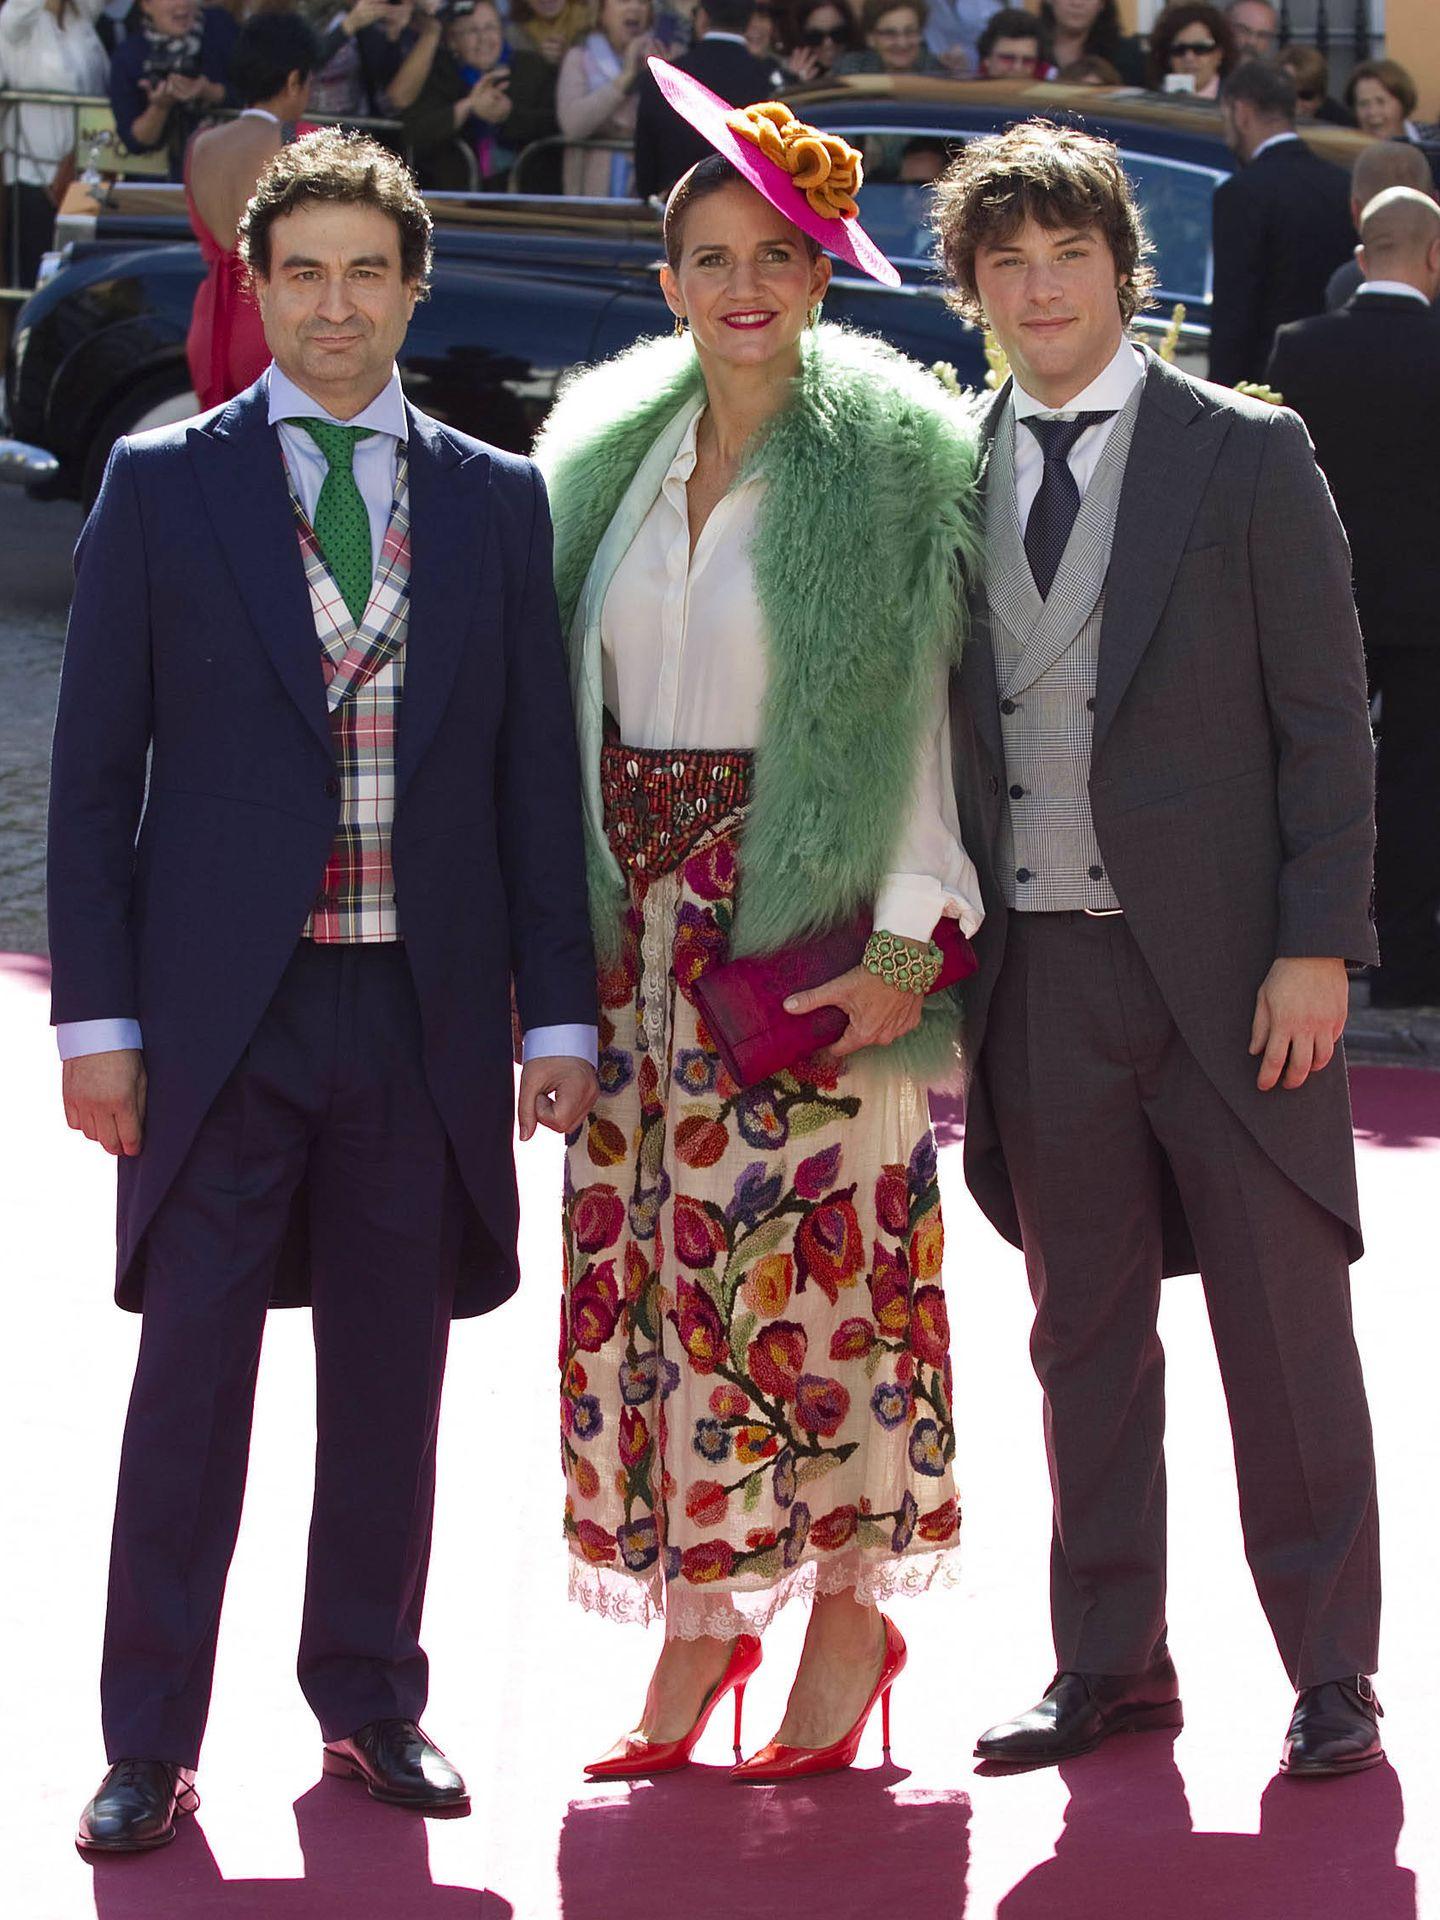 Pepe Rodríguez, Samantha Vallejo-Nágera y Jordi Cruz. (Getty)